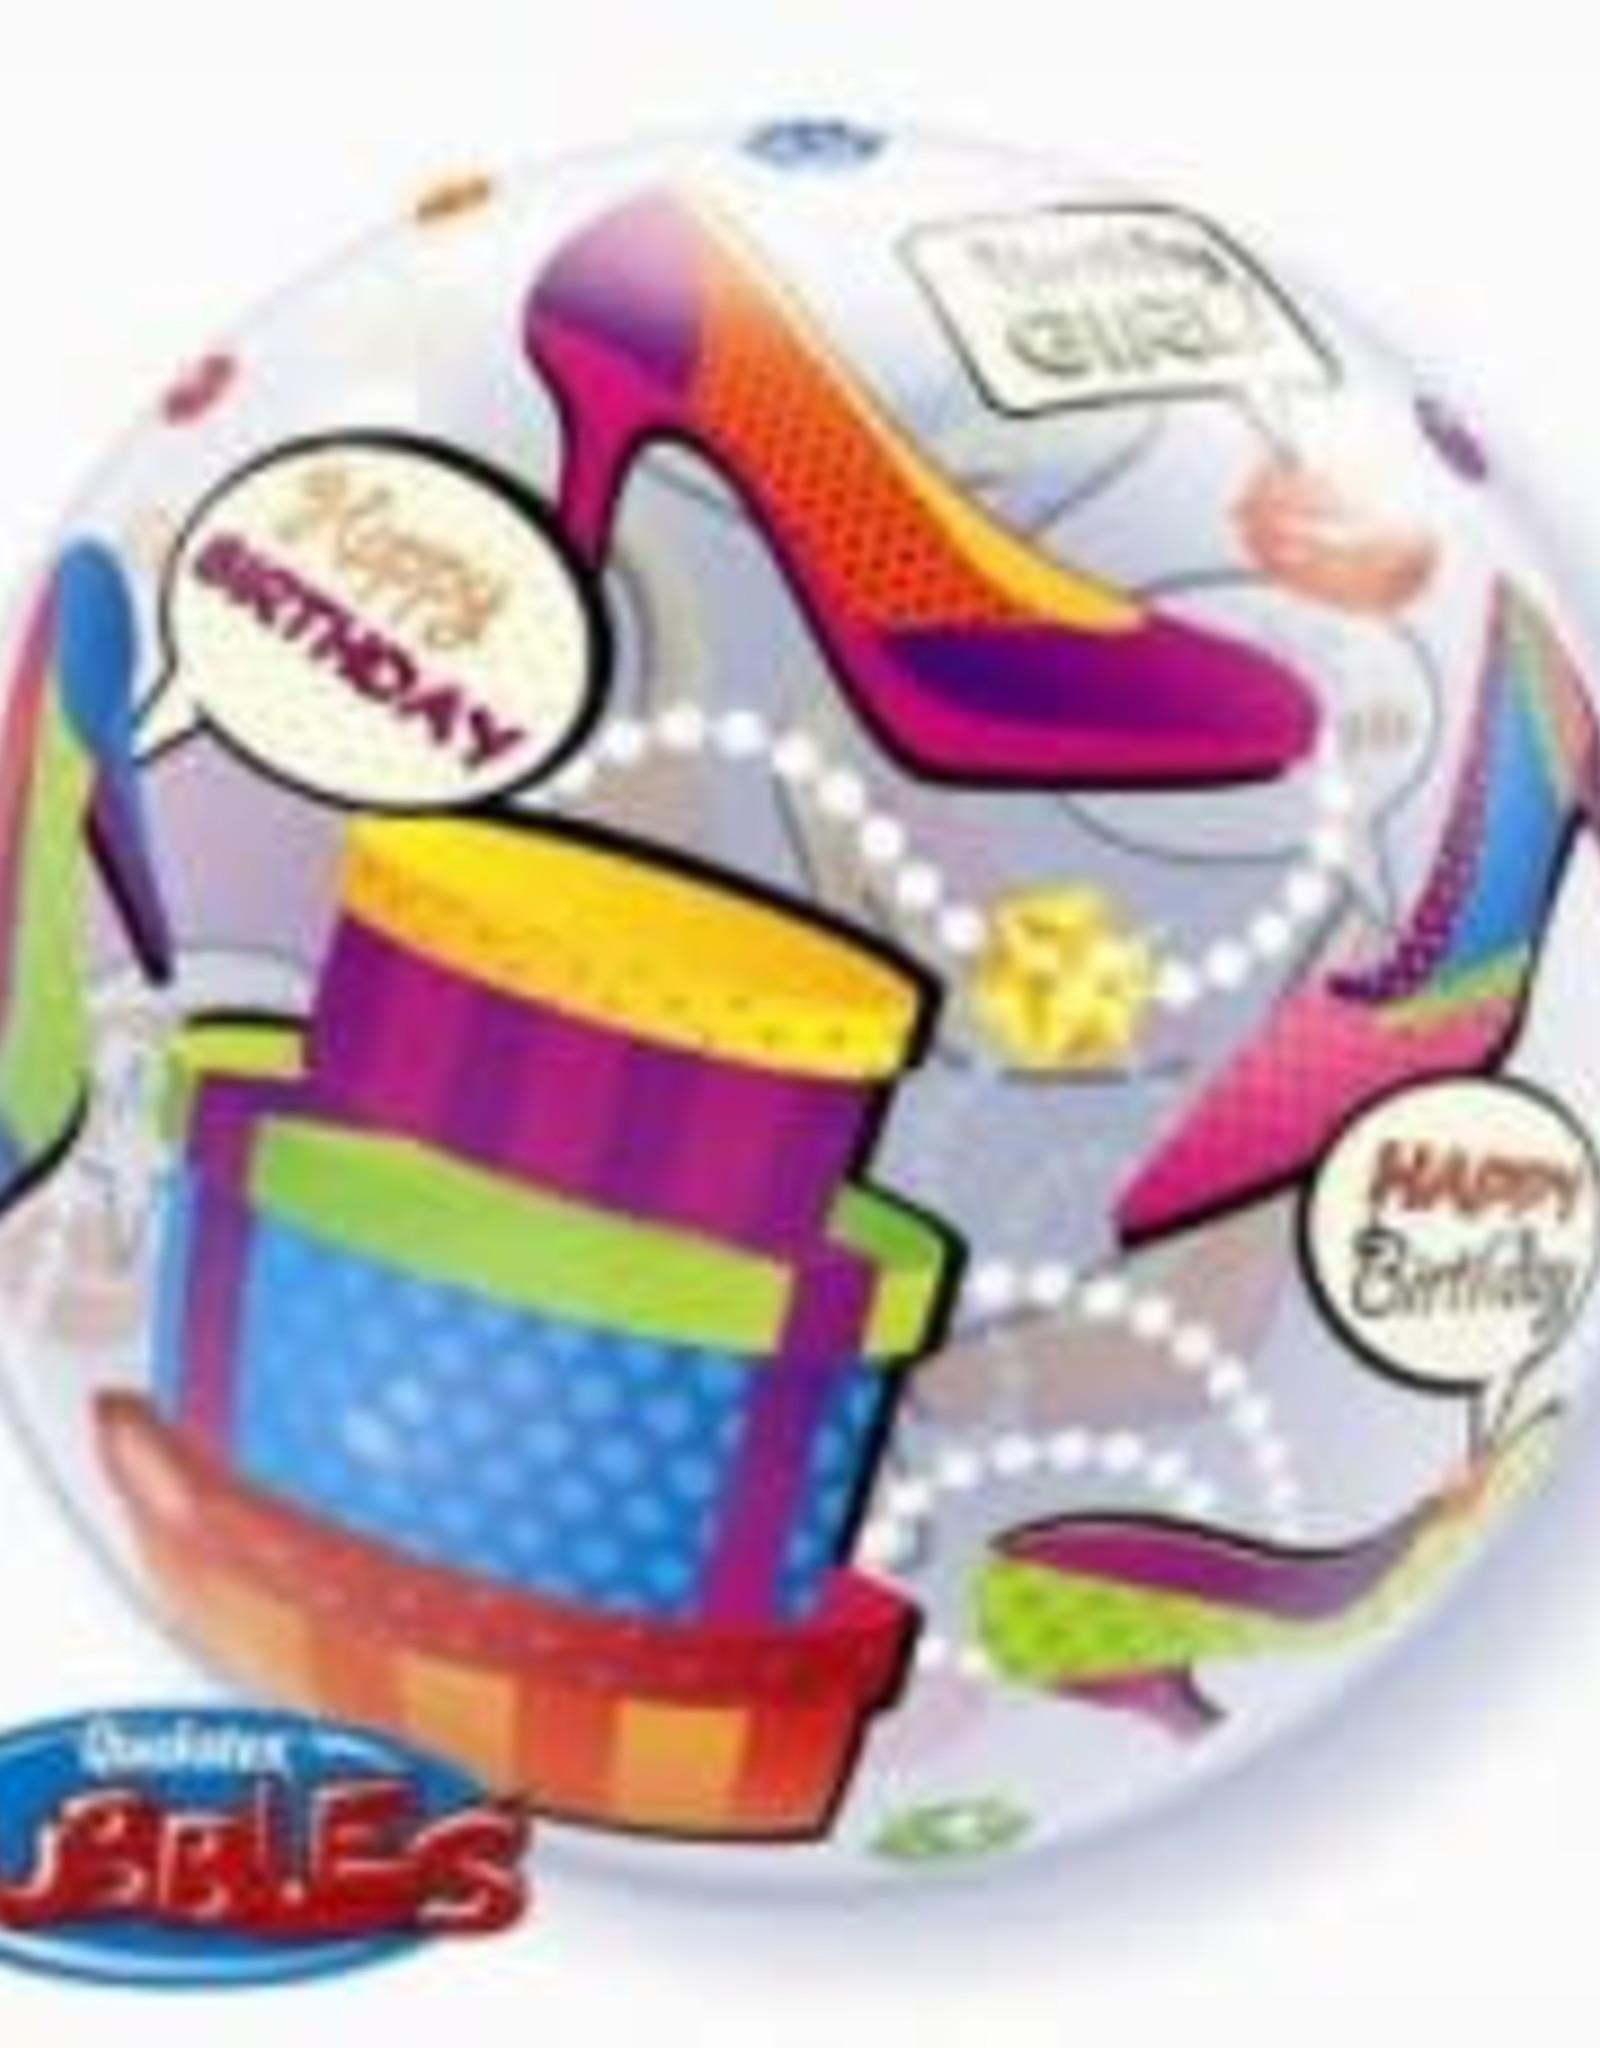 Sempertex avalloons bubbles balloon happy birdhay shopping girl